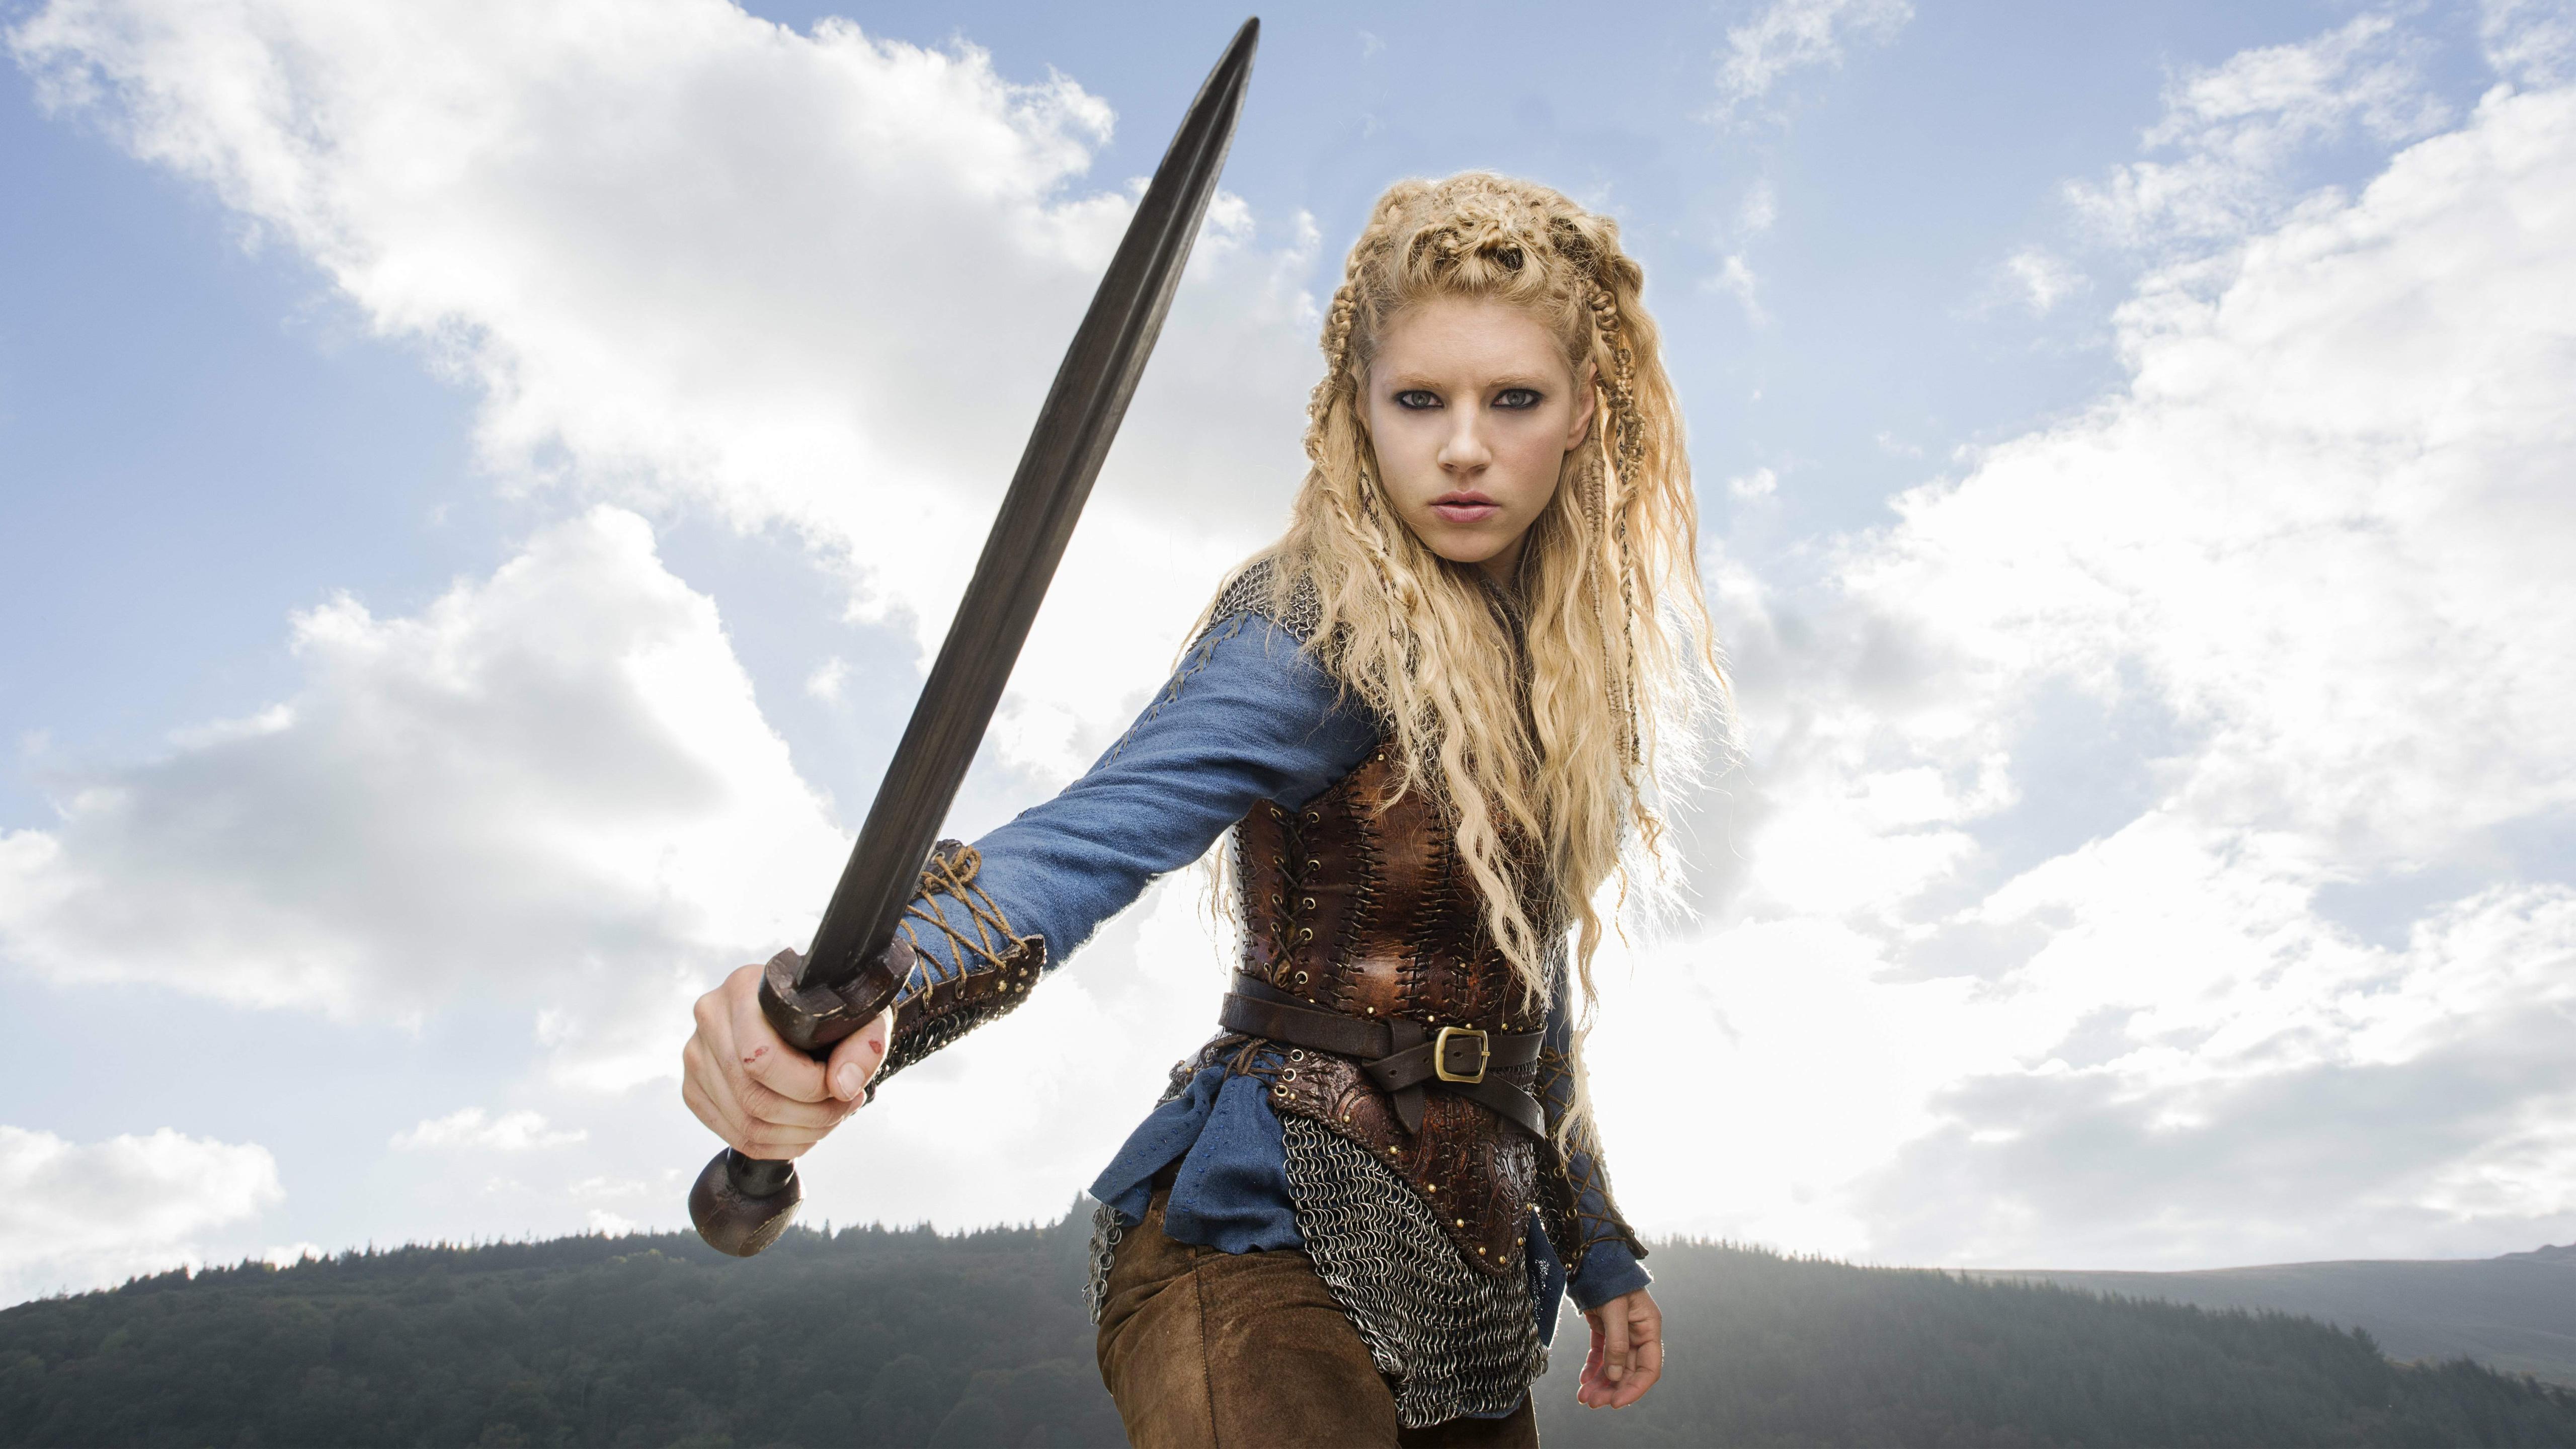 Katheryn Winnick Vikings Lagertha Lothbrok Promos Poster Women Actress Warrior Girls Wallpaper Resolution 5120x2880 Id 540689 Wallha Com